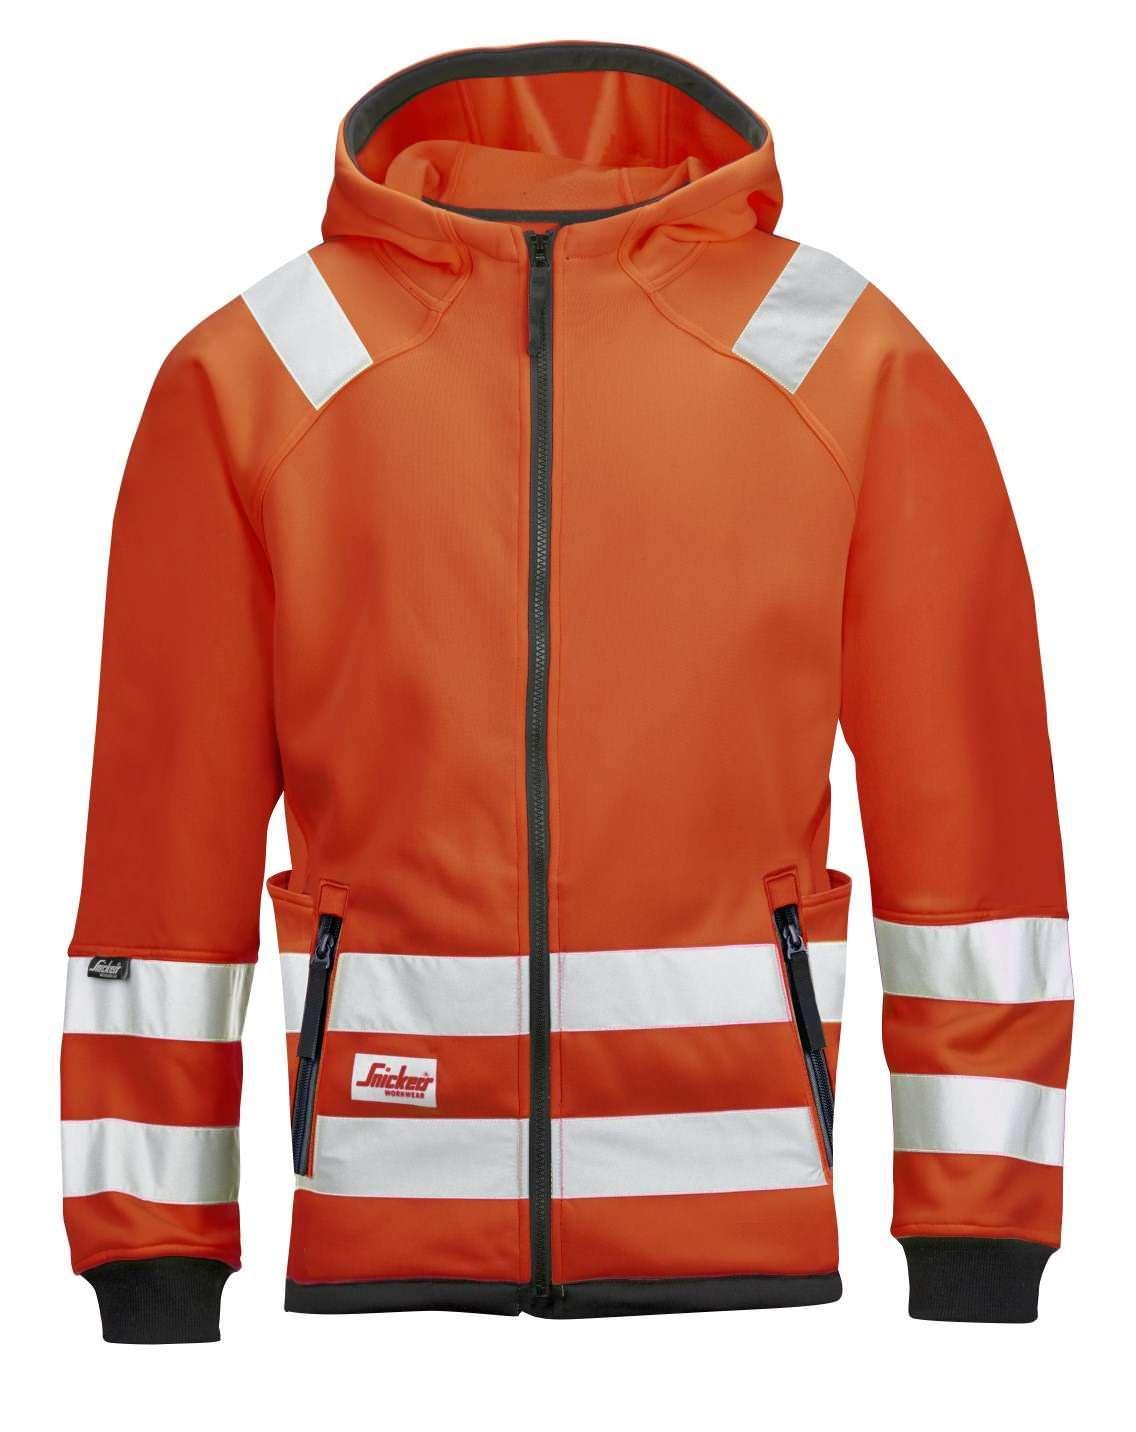 Snickers 8043 High-Vis Micro Fleece Jacket, Class 3